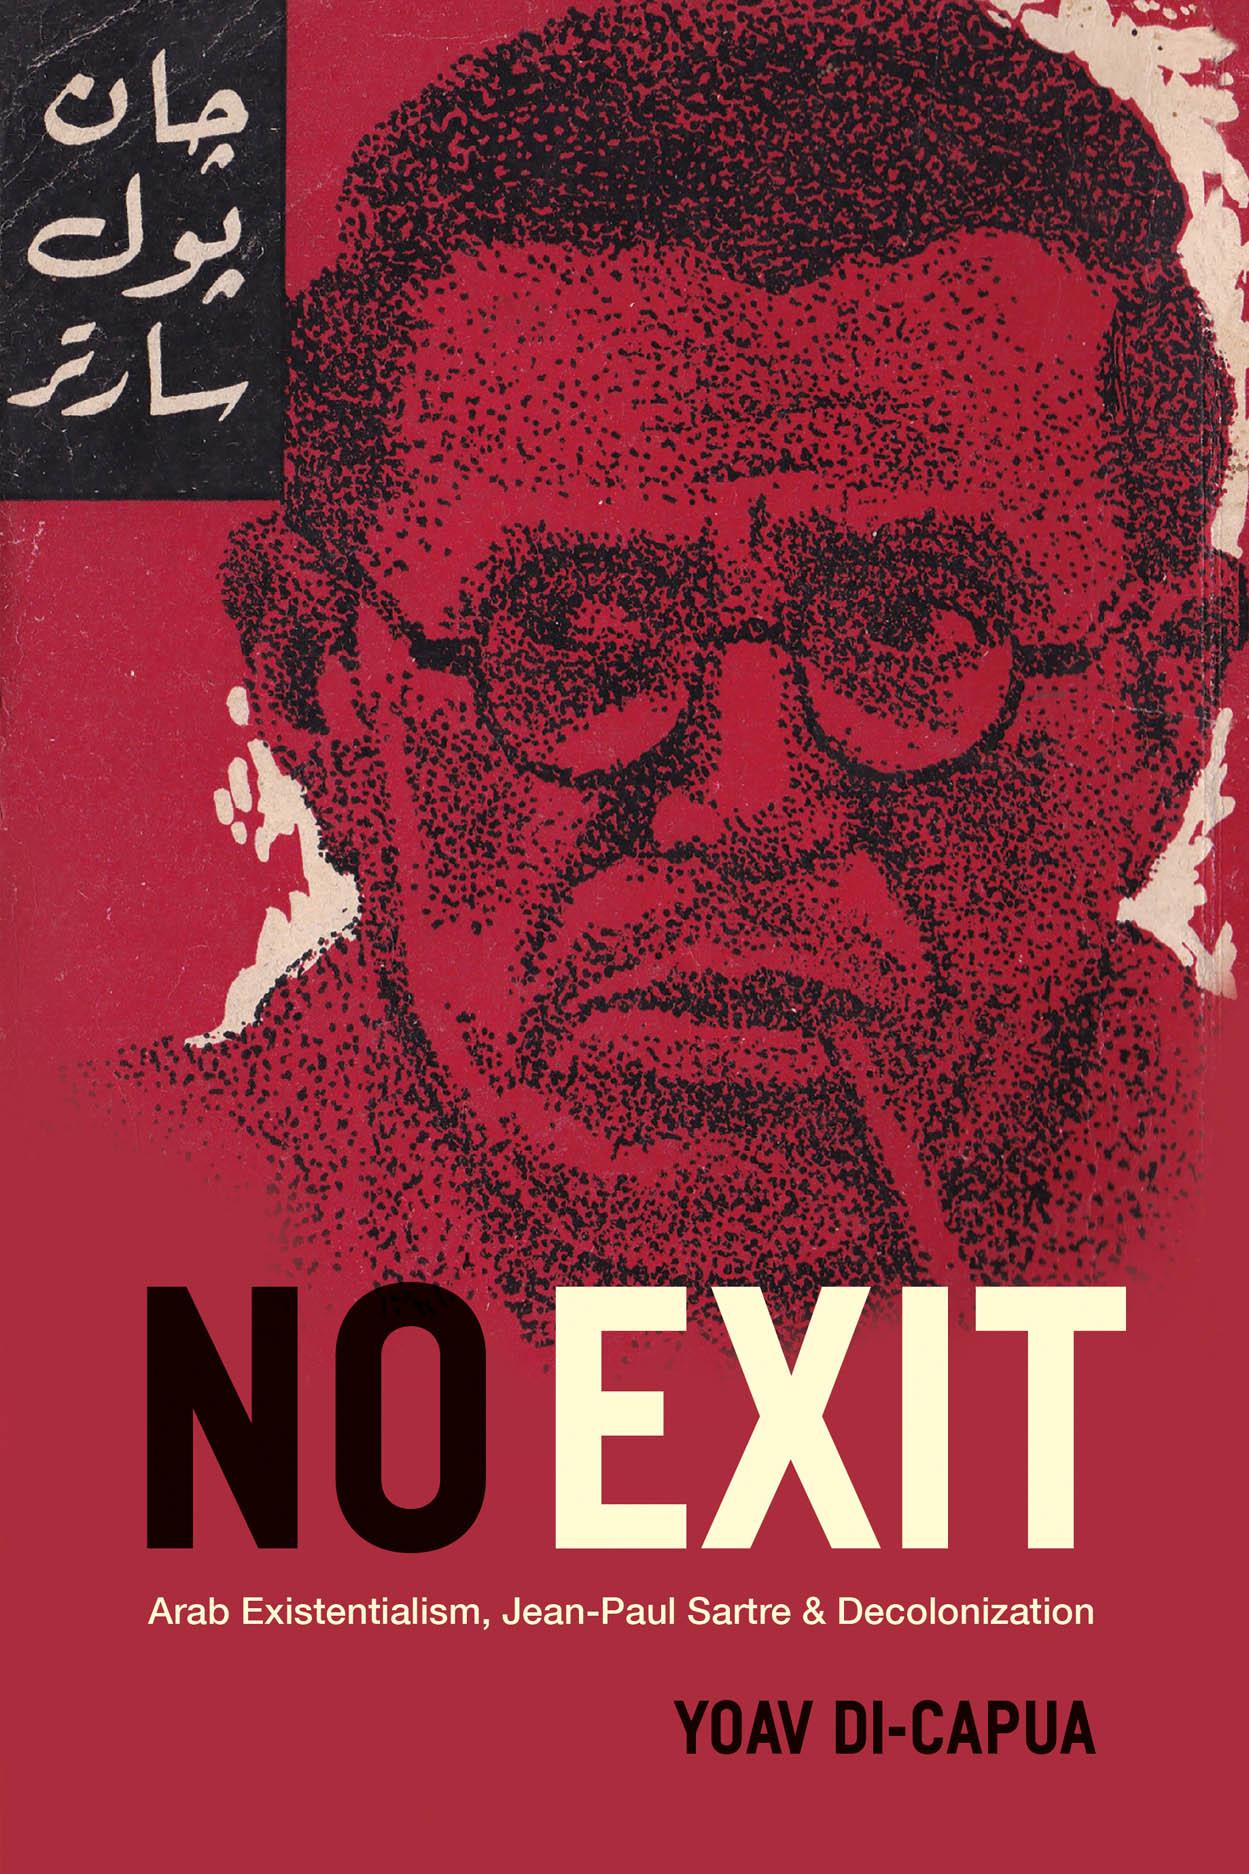 Book cover of No Exit by Yoav Di-Capua.